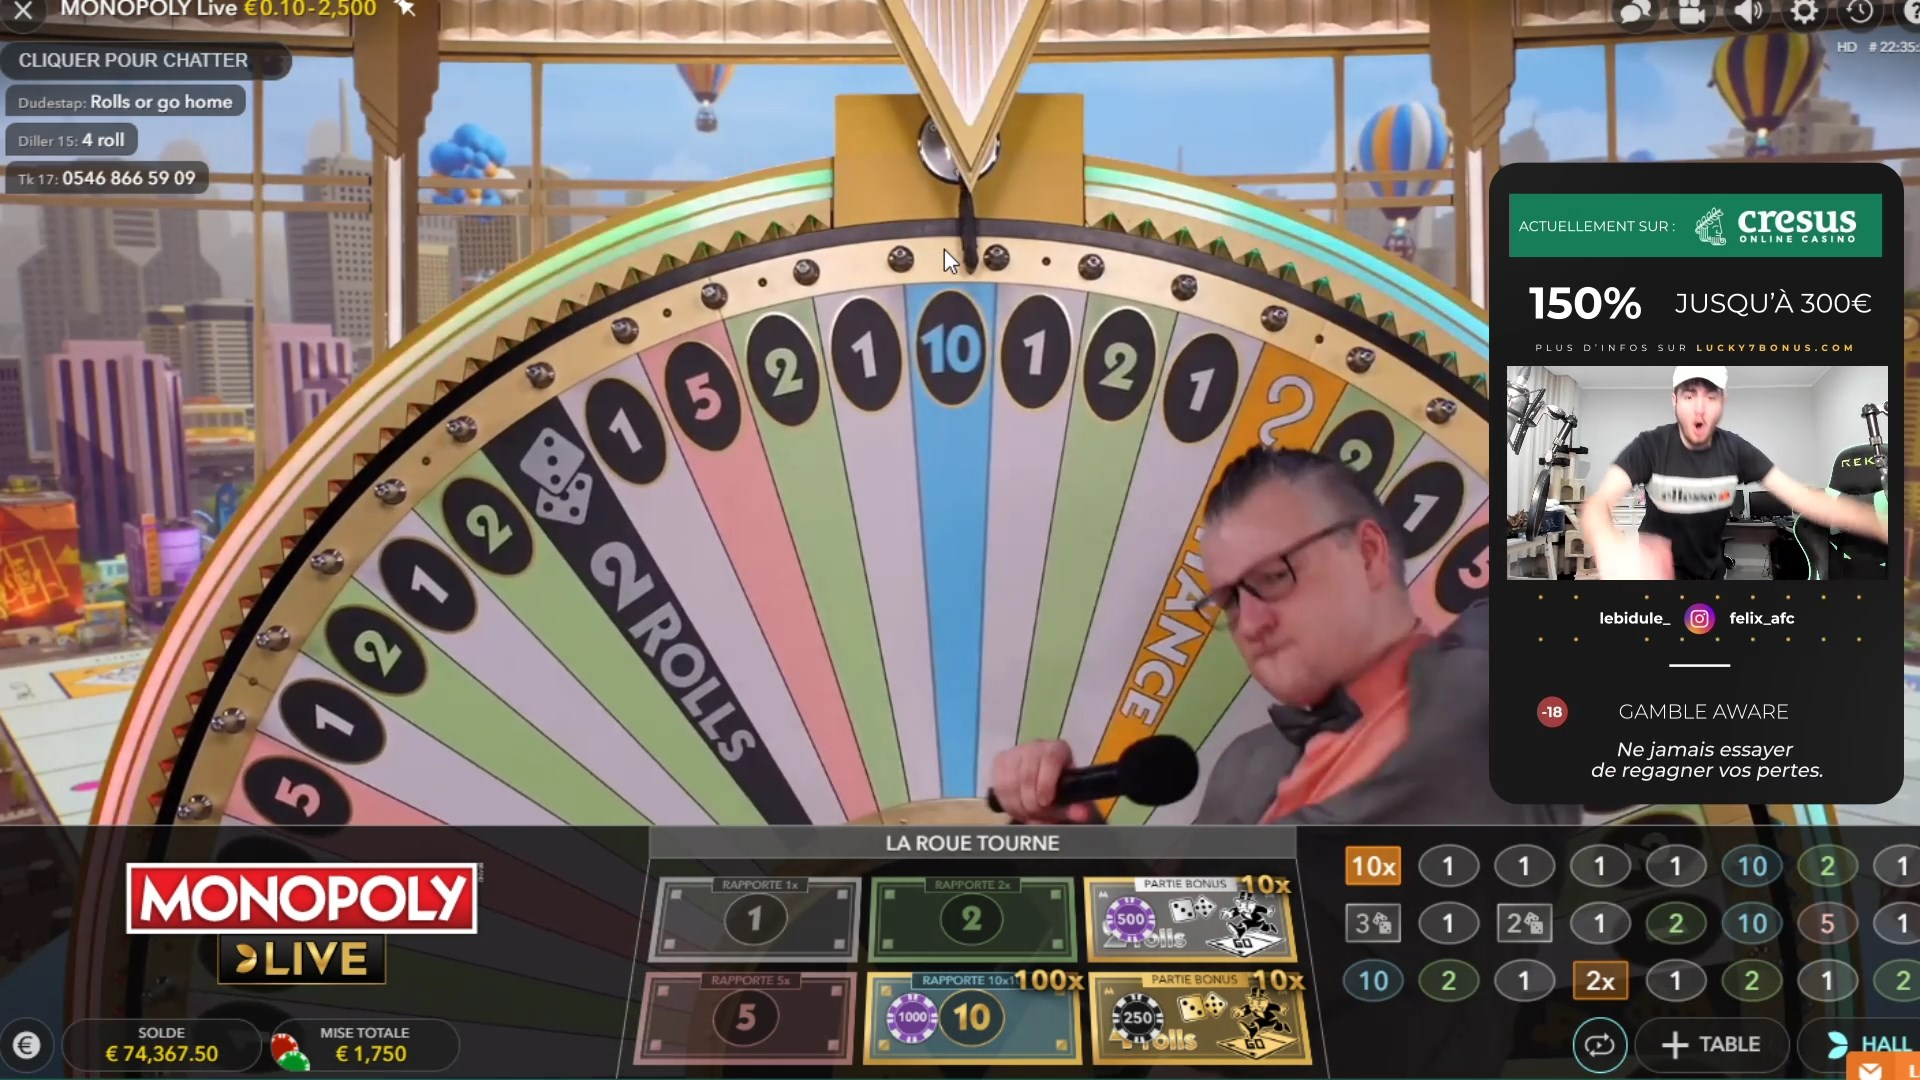 Bidule gagne 100 000€ au Monopoly Live